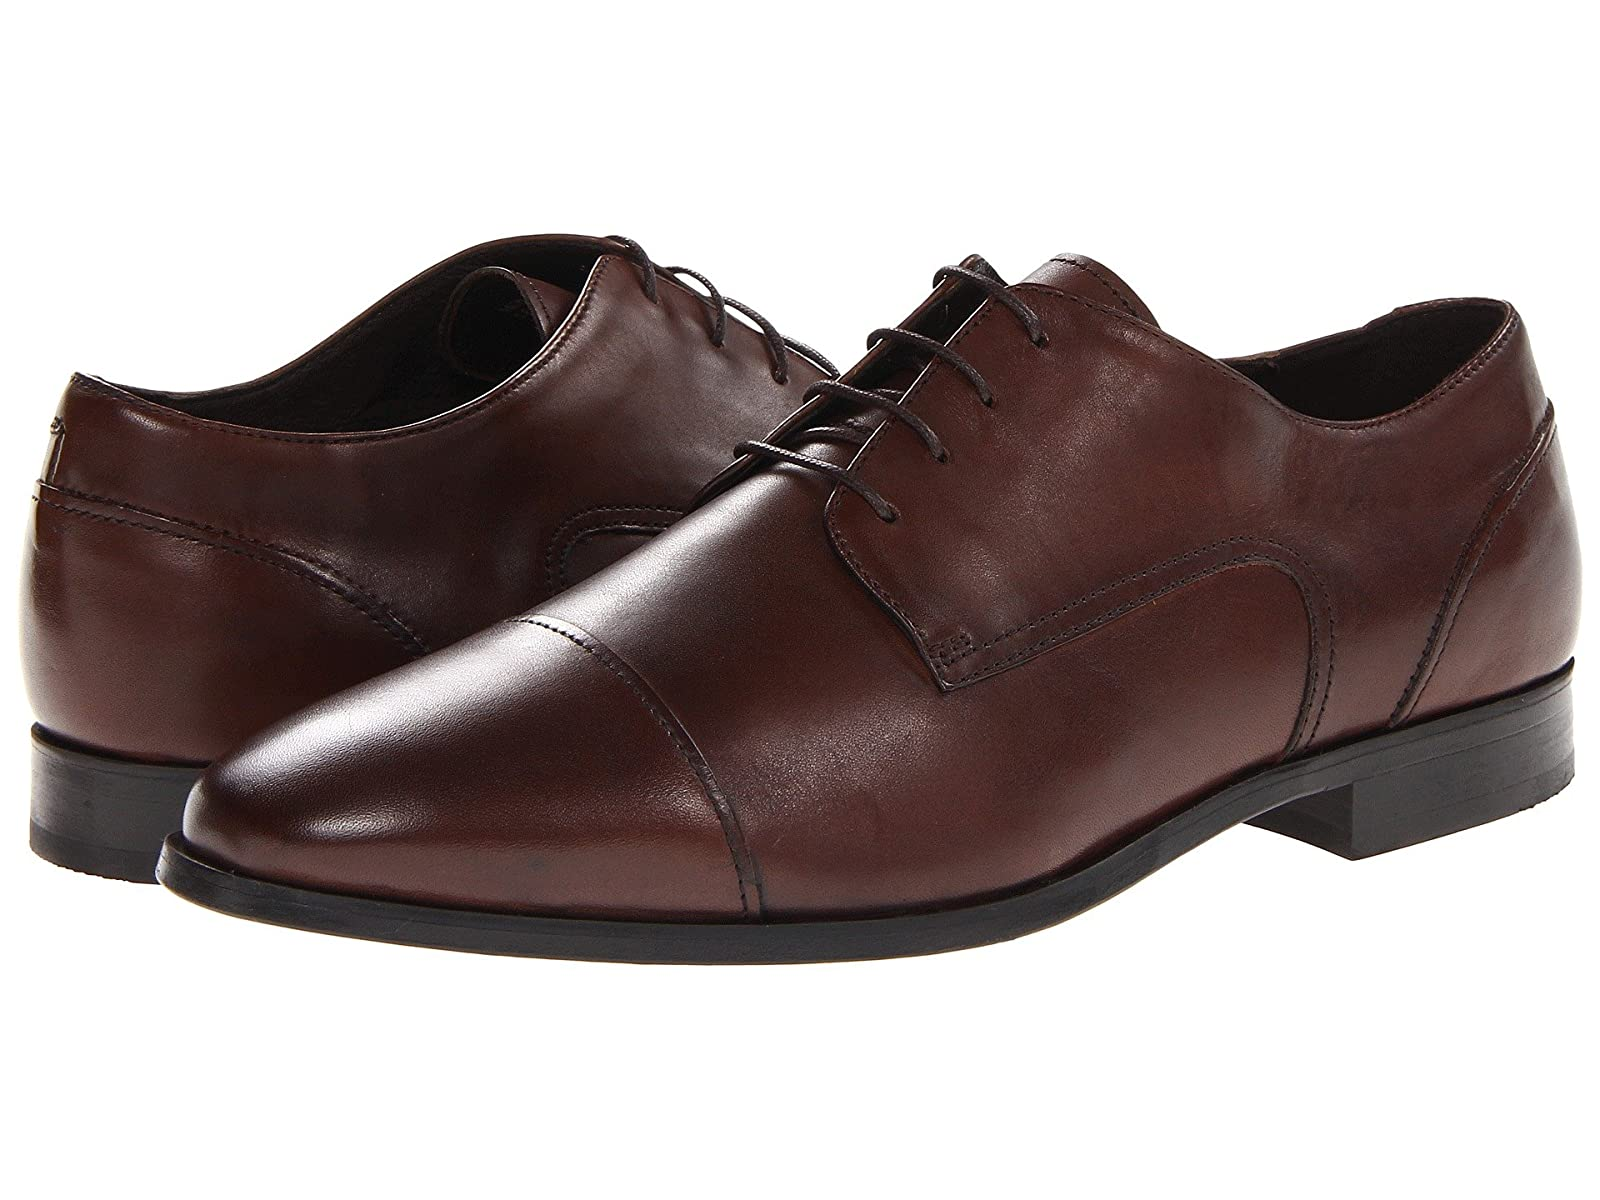 Florsheim Jet Cap Toe OxfordAtmospheric grades have affordable shoes